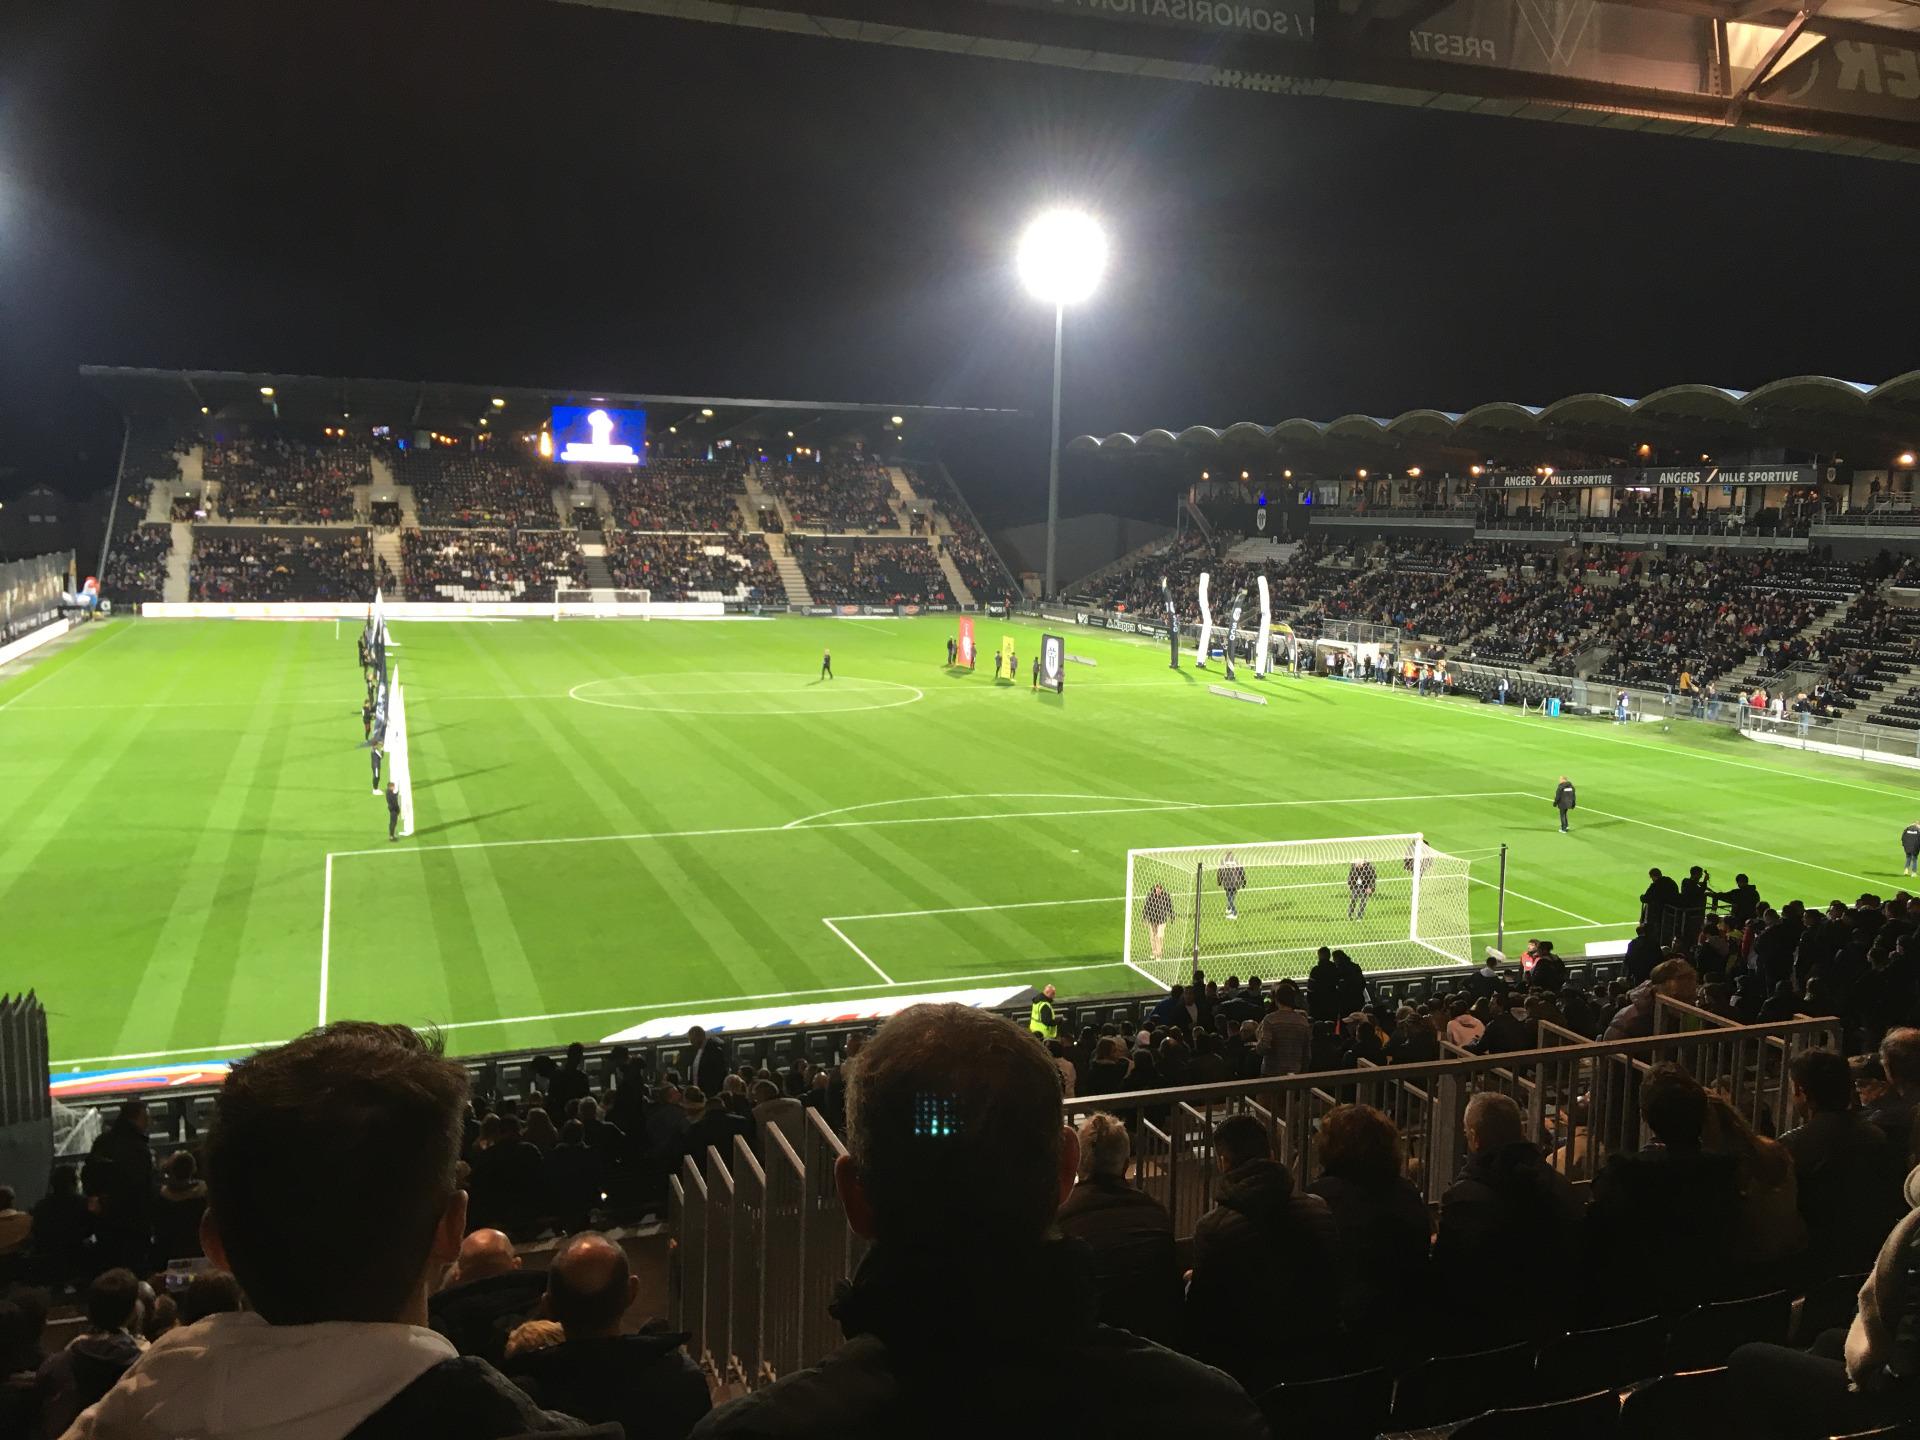 Stade Raymond Kopa Section Coubertin E Row AA Seat 137